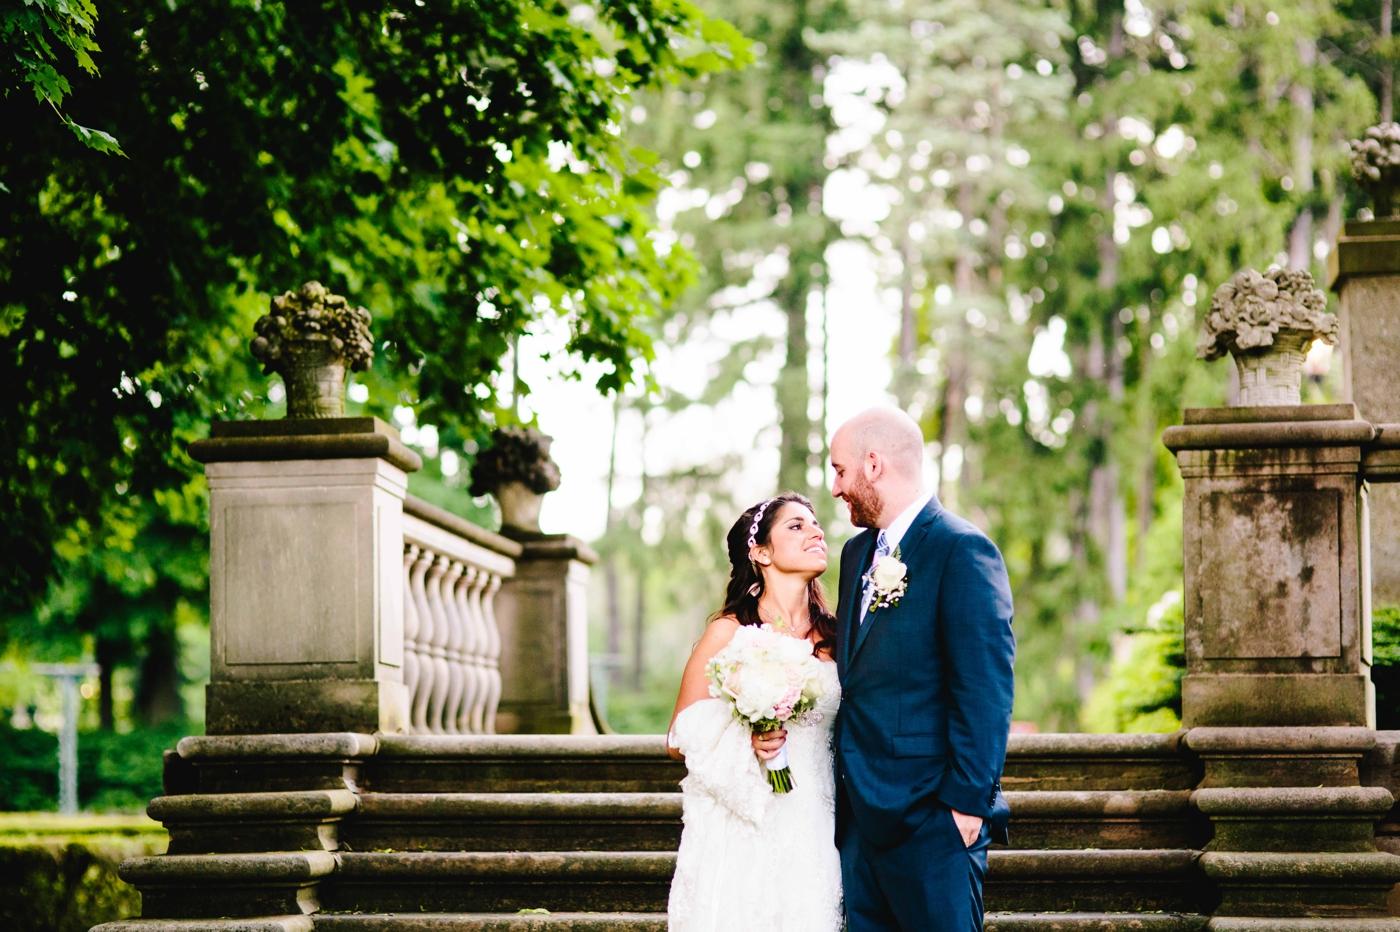 chicago-fine-art-wedding-photography-svihra9